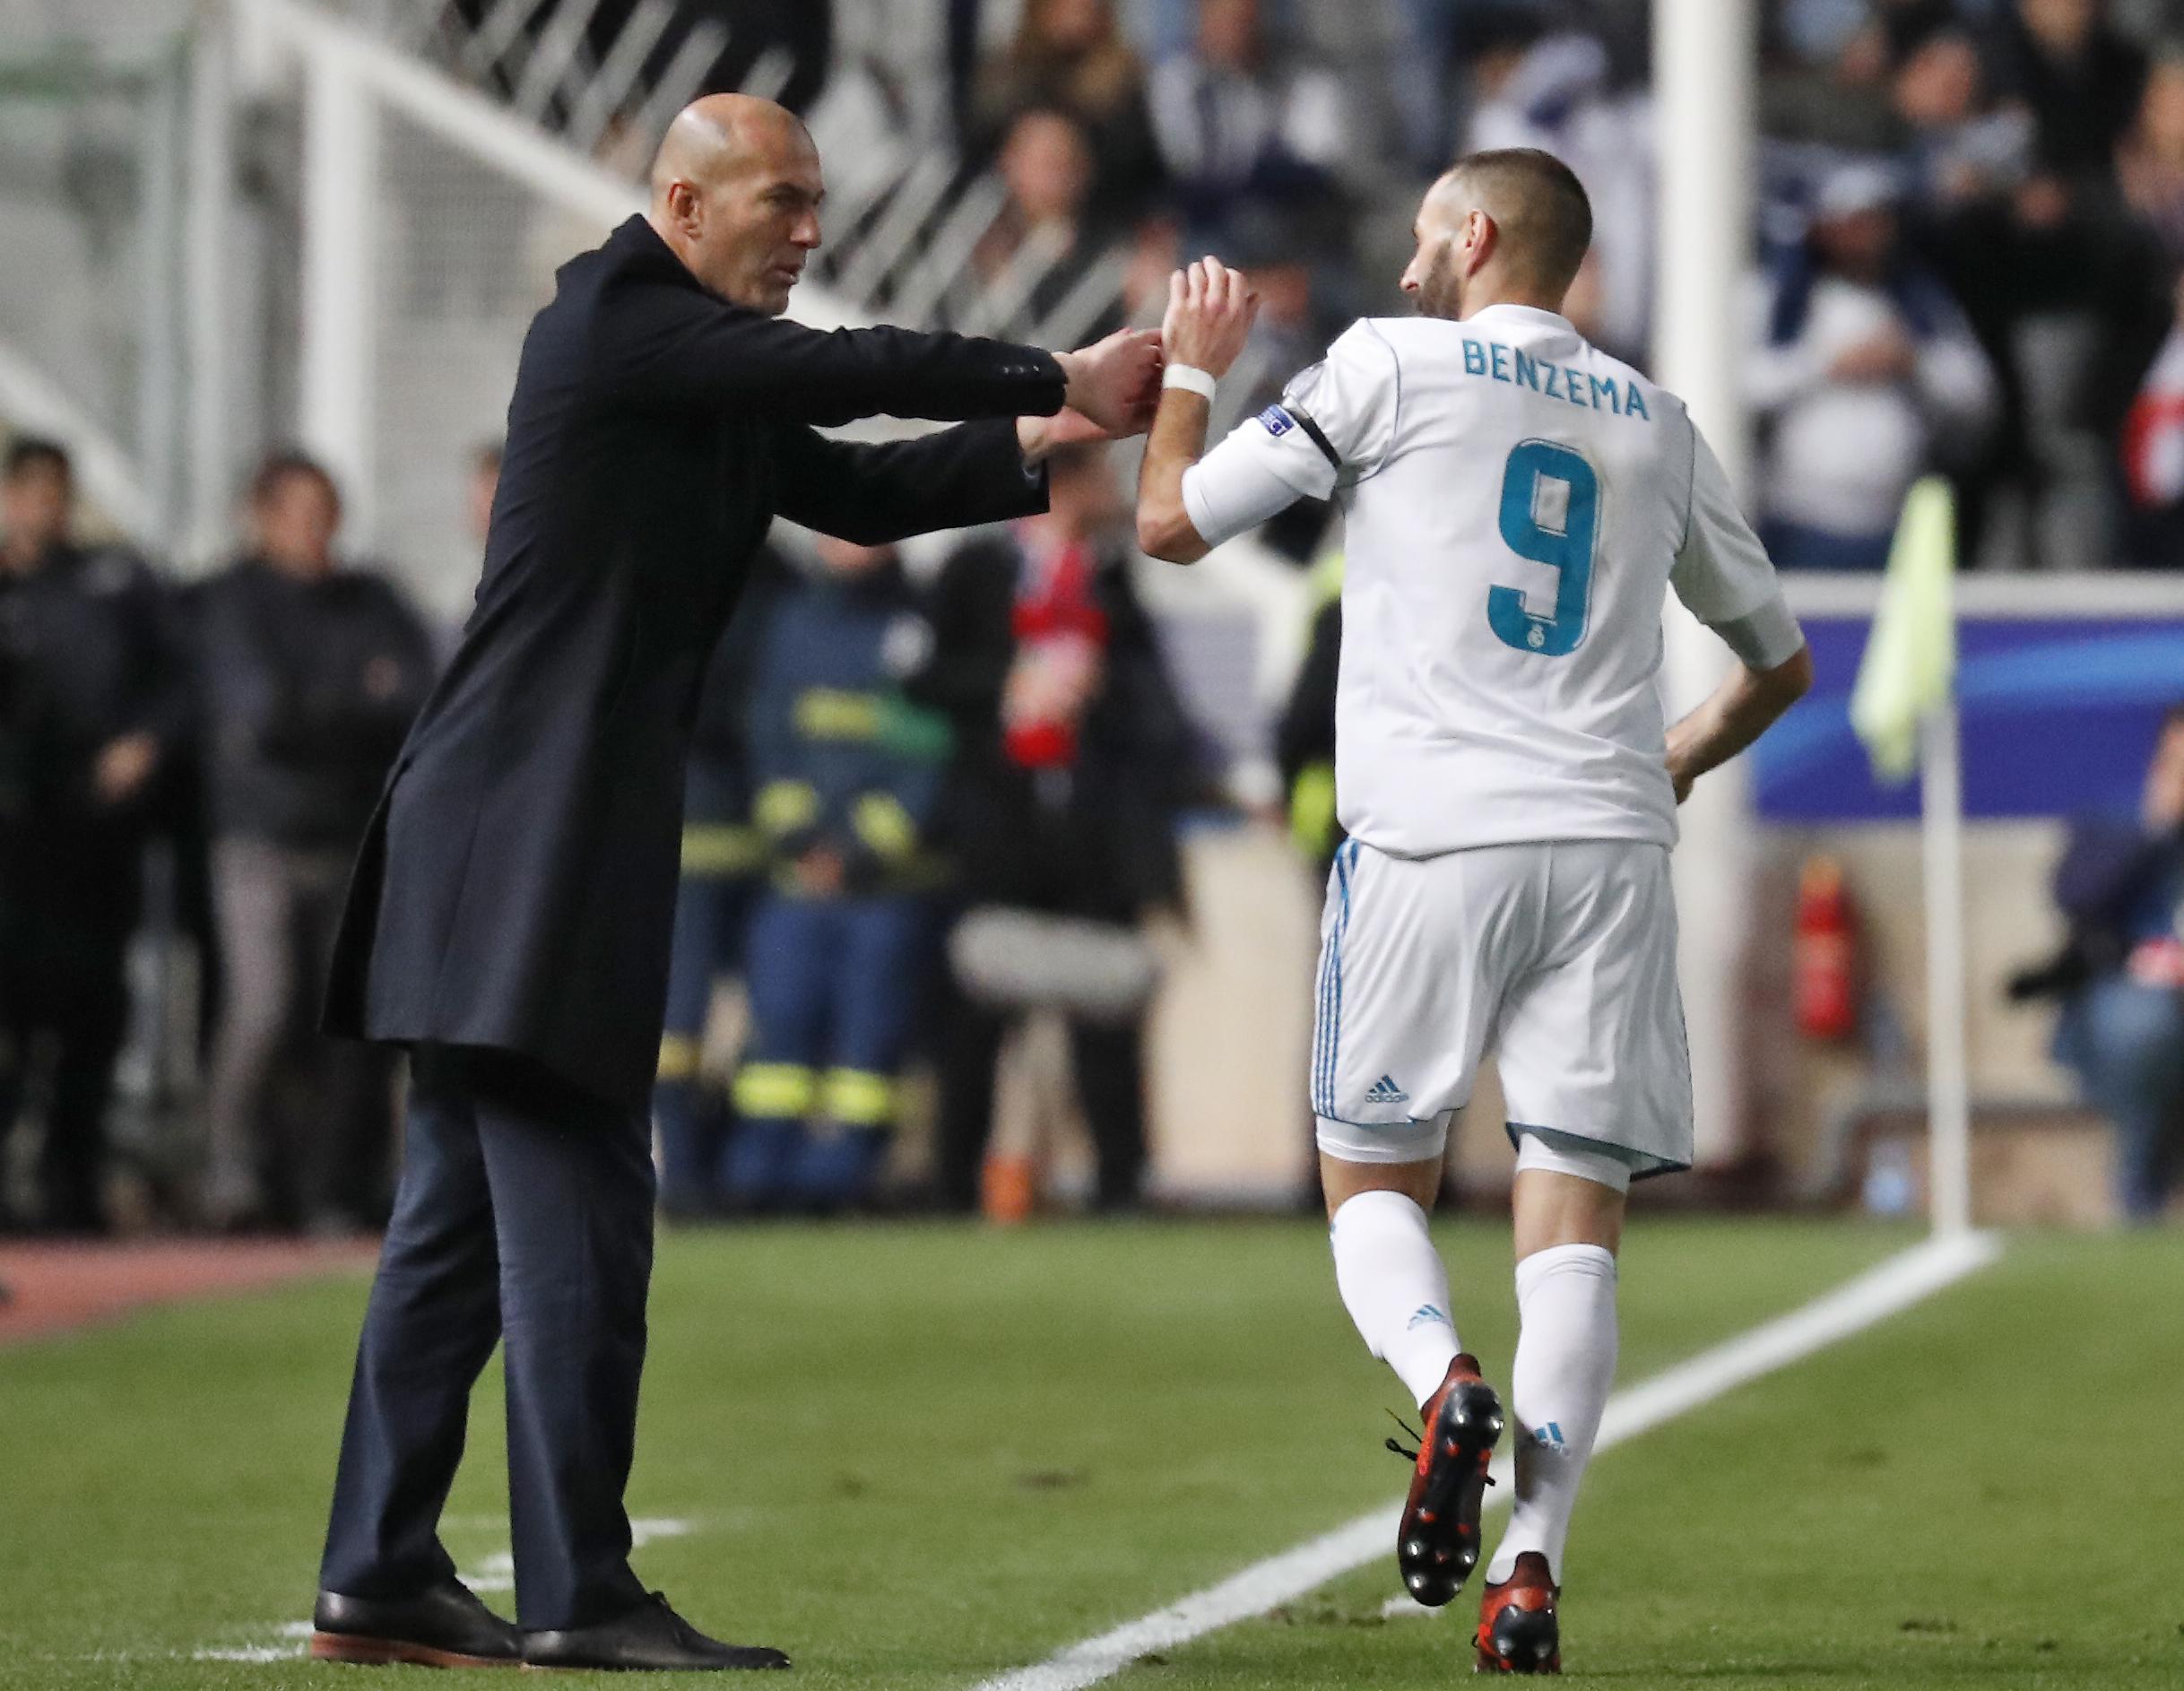 La presse espagnole tombe sur Zidane et Benzema